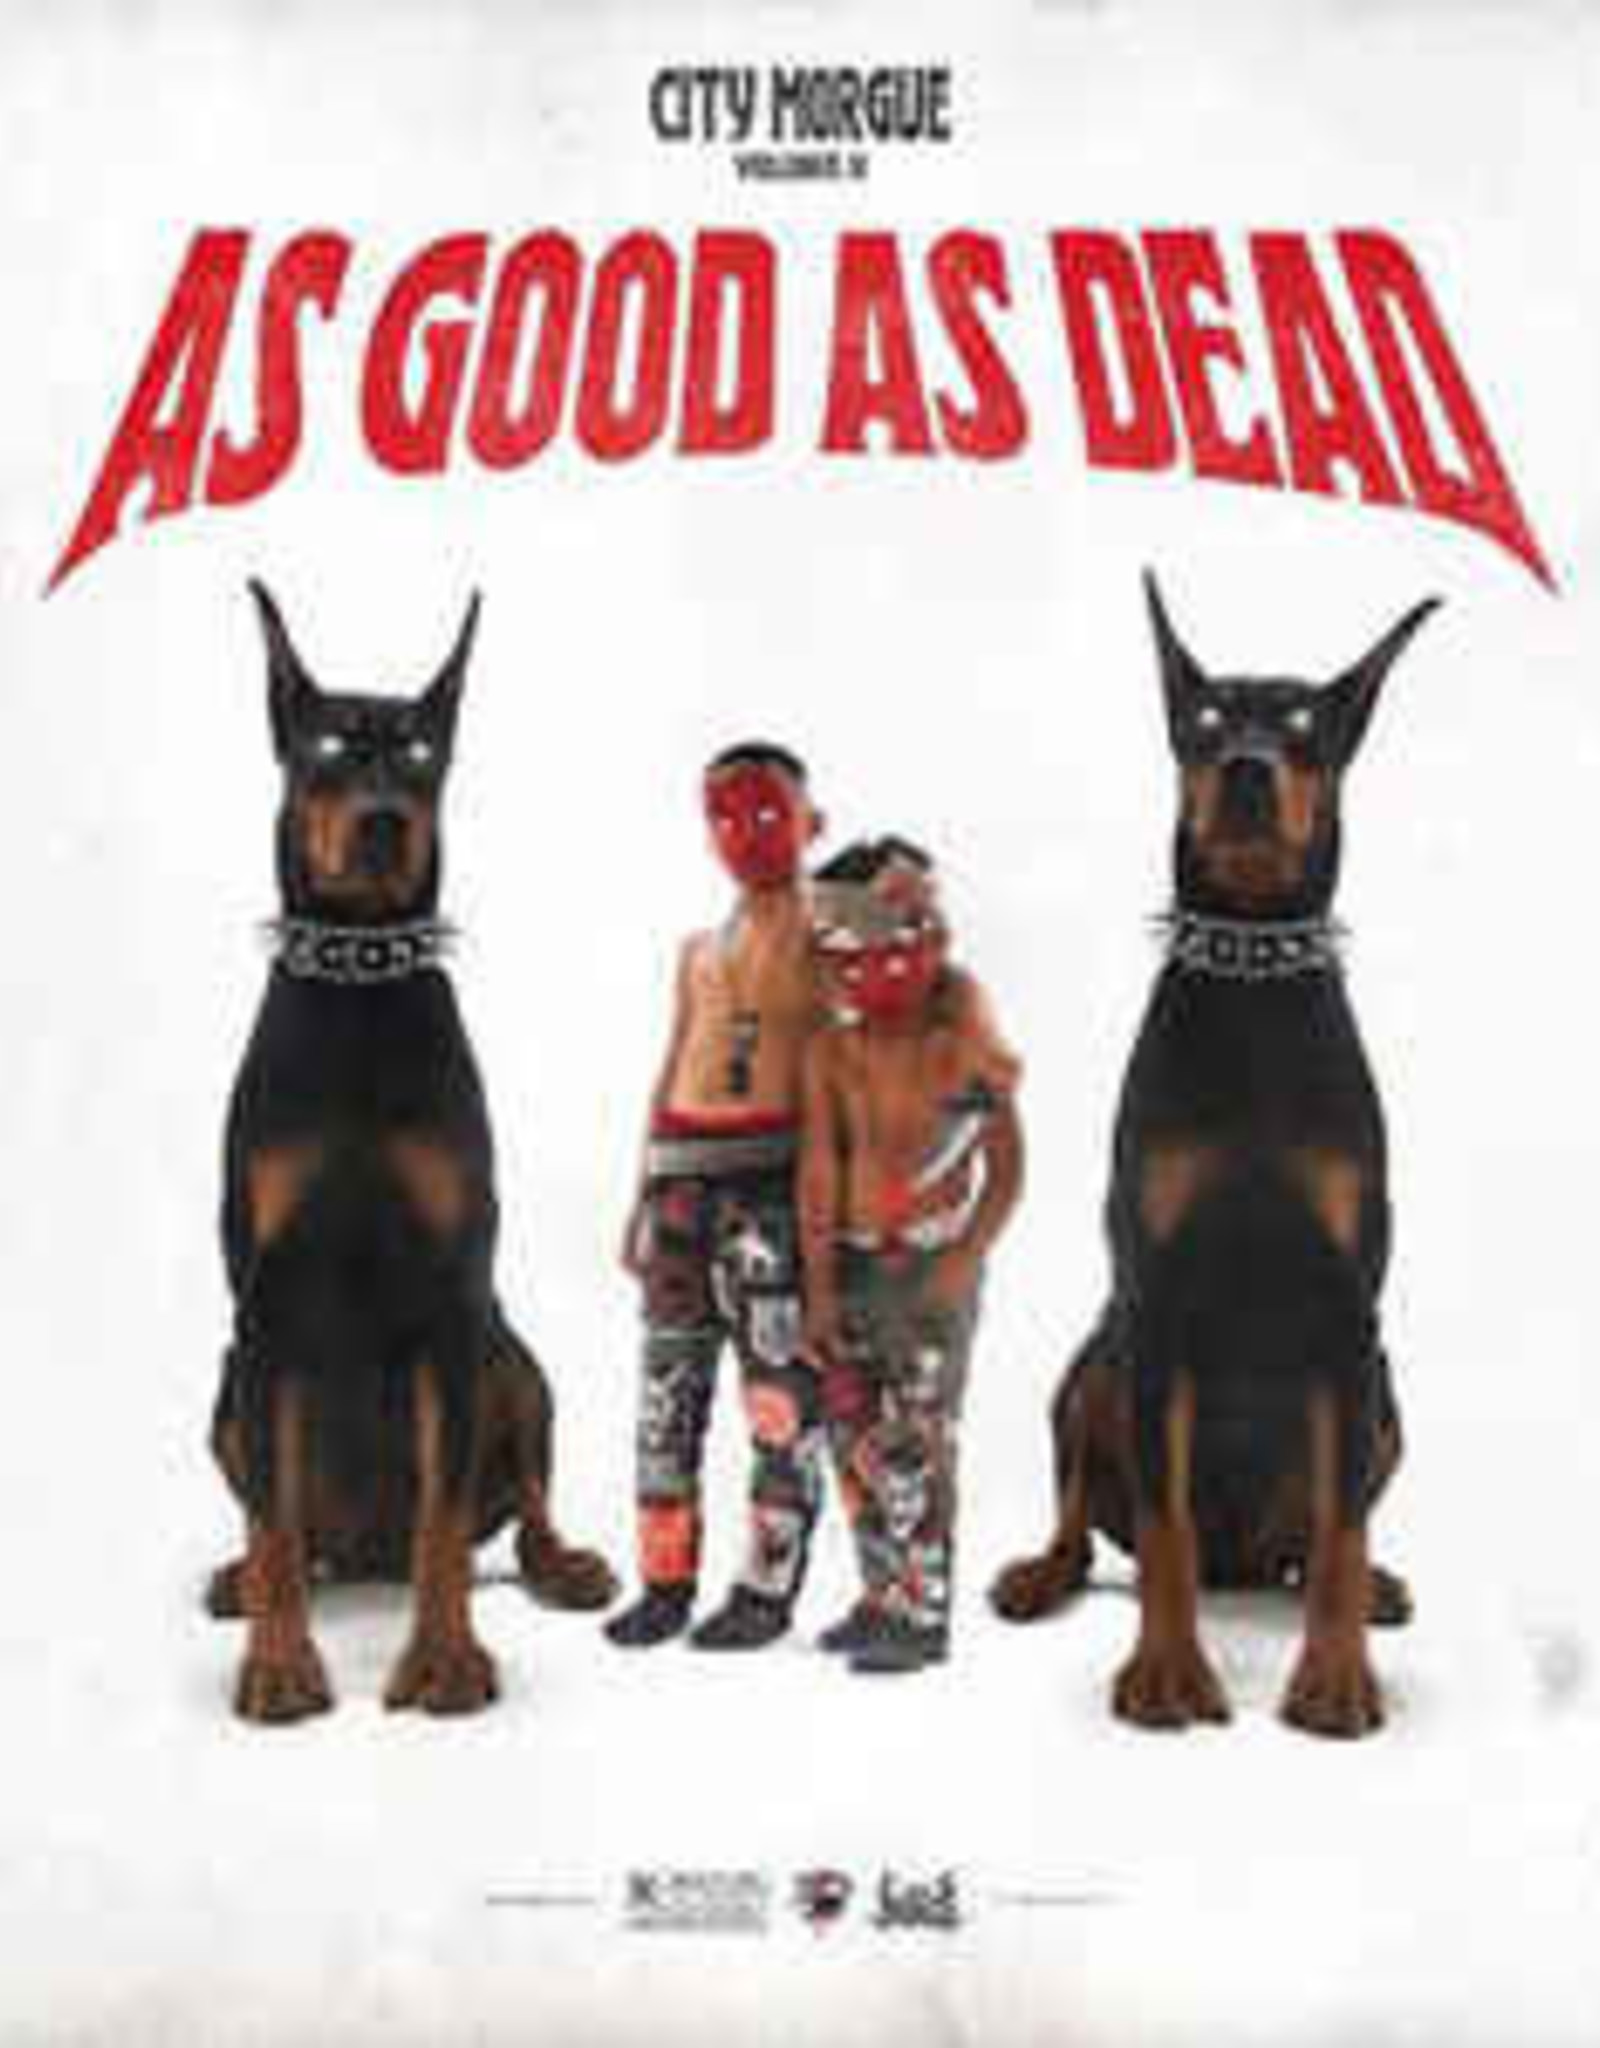 City Morgue - City Morgue Vol 2: As Good As Dead (Red & White Splatter Vinyl)  (RSD 2020)